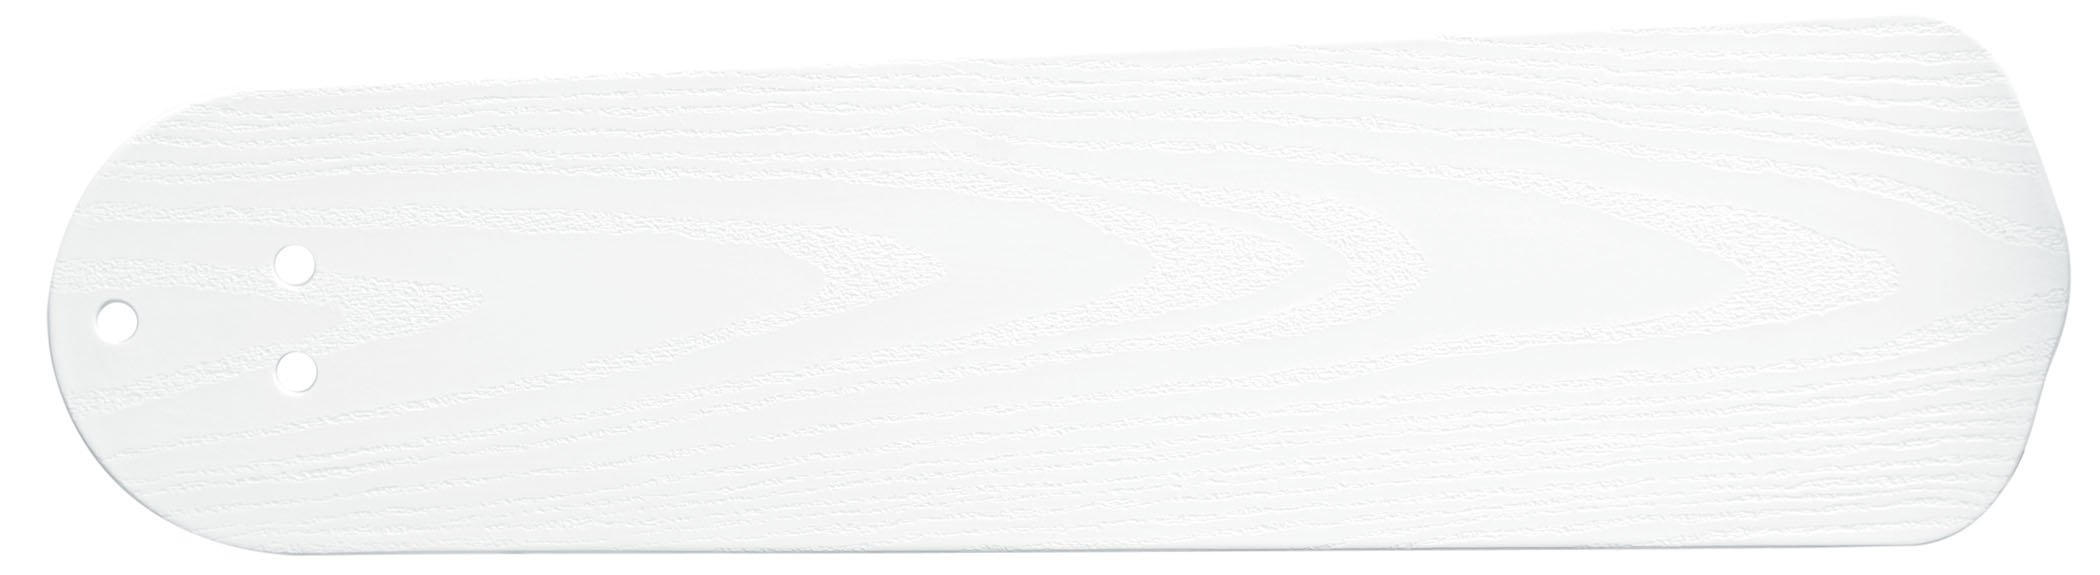 Casablanca 99021, Five All-Weather ABS Matte Snow White Blades, 52-54'' Span